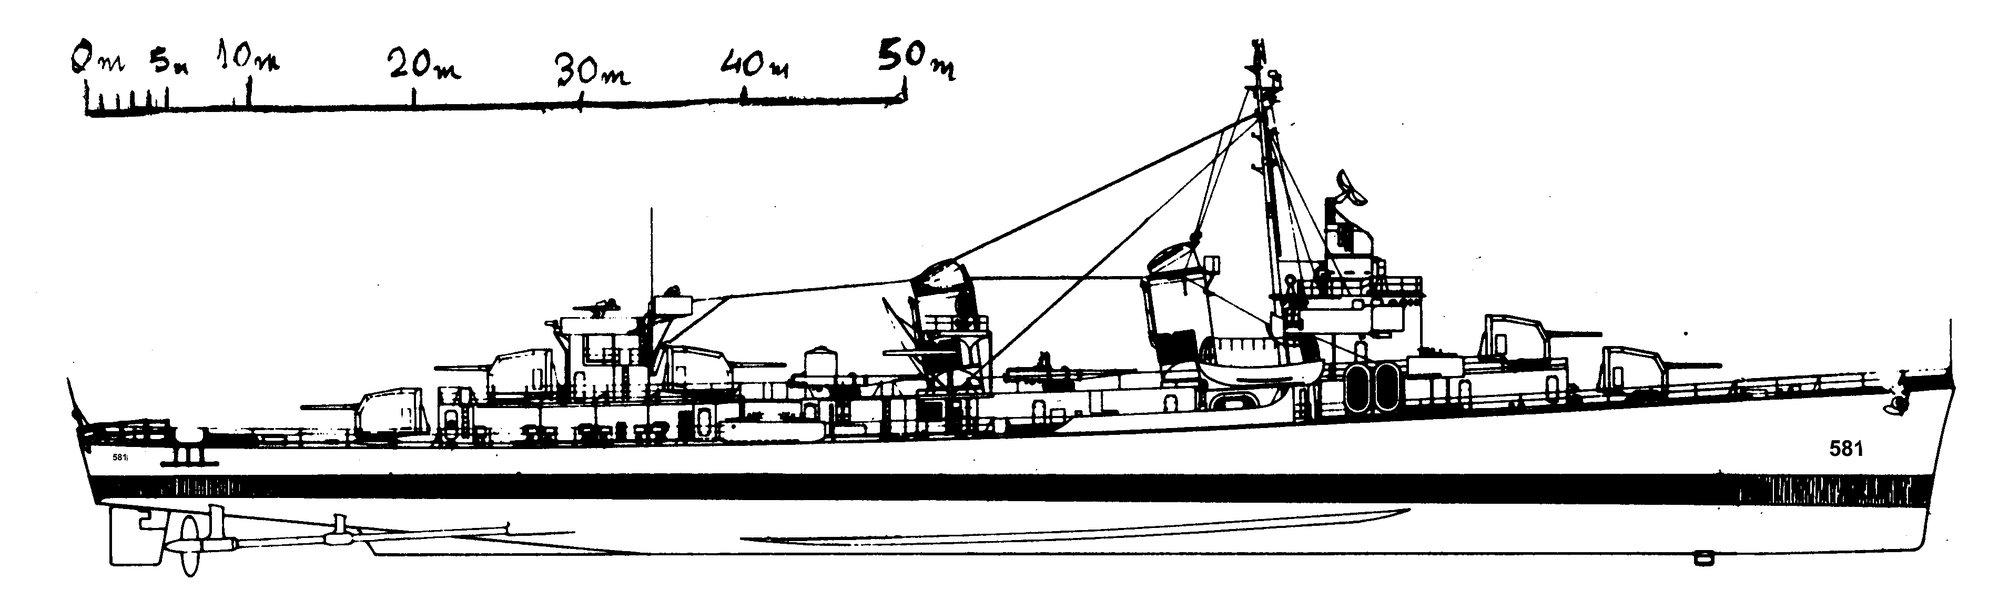 USS+Charrette+%28DD-581%29+profile.jpg